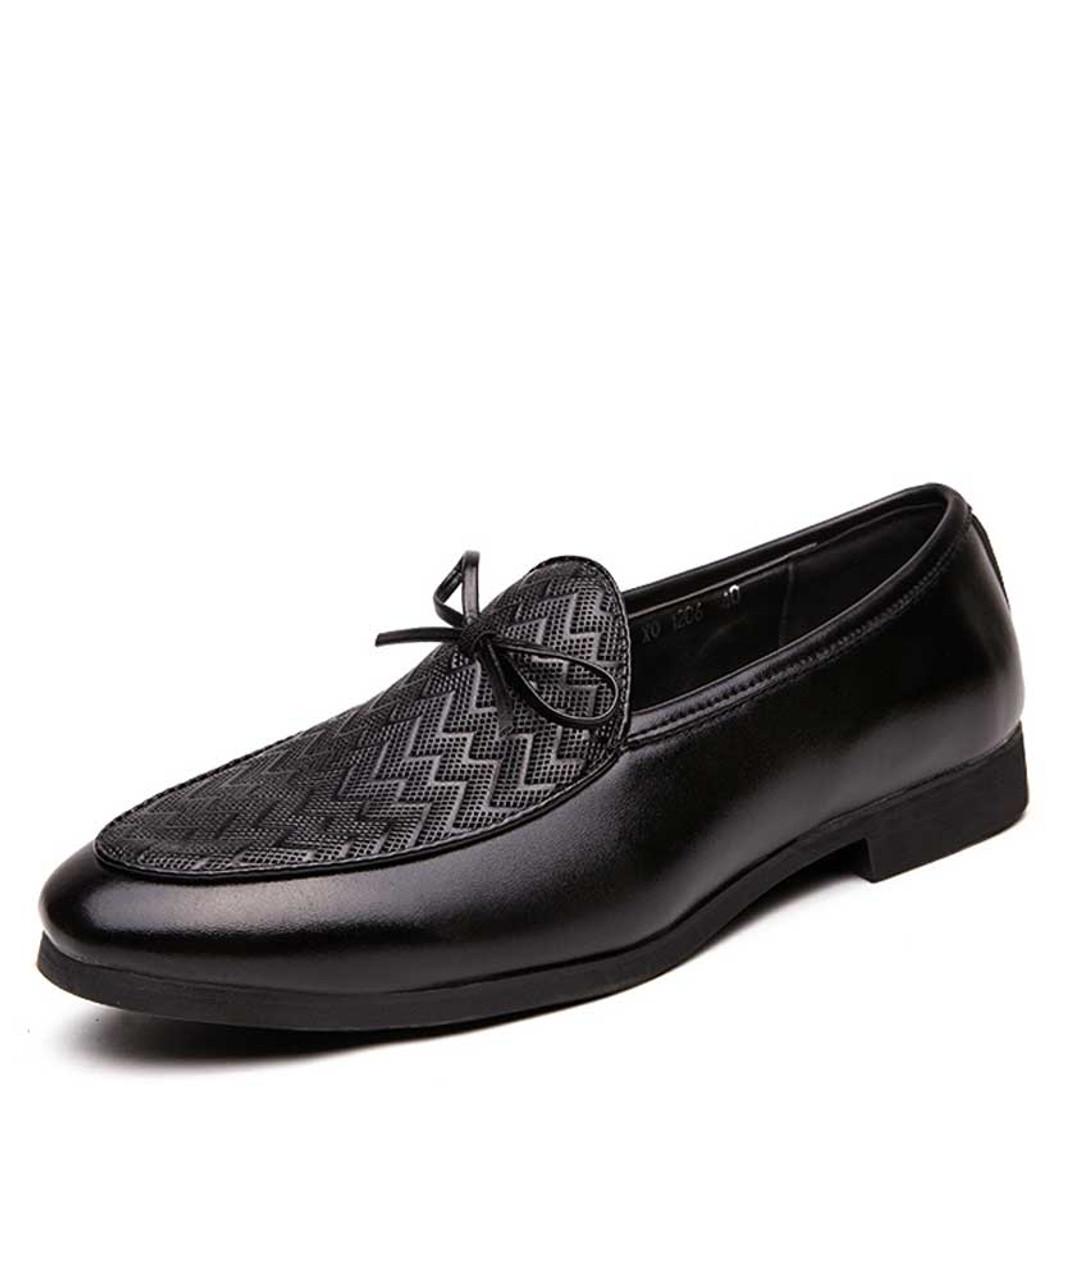 Black Weave Pattern Bow Tie Leather Slip On Dress Shoe Mens Dress Shoes Online 2015ms